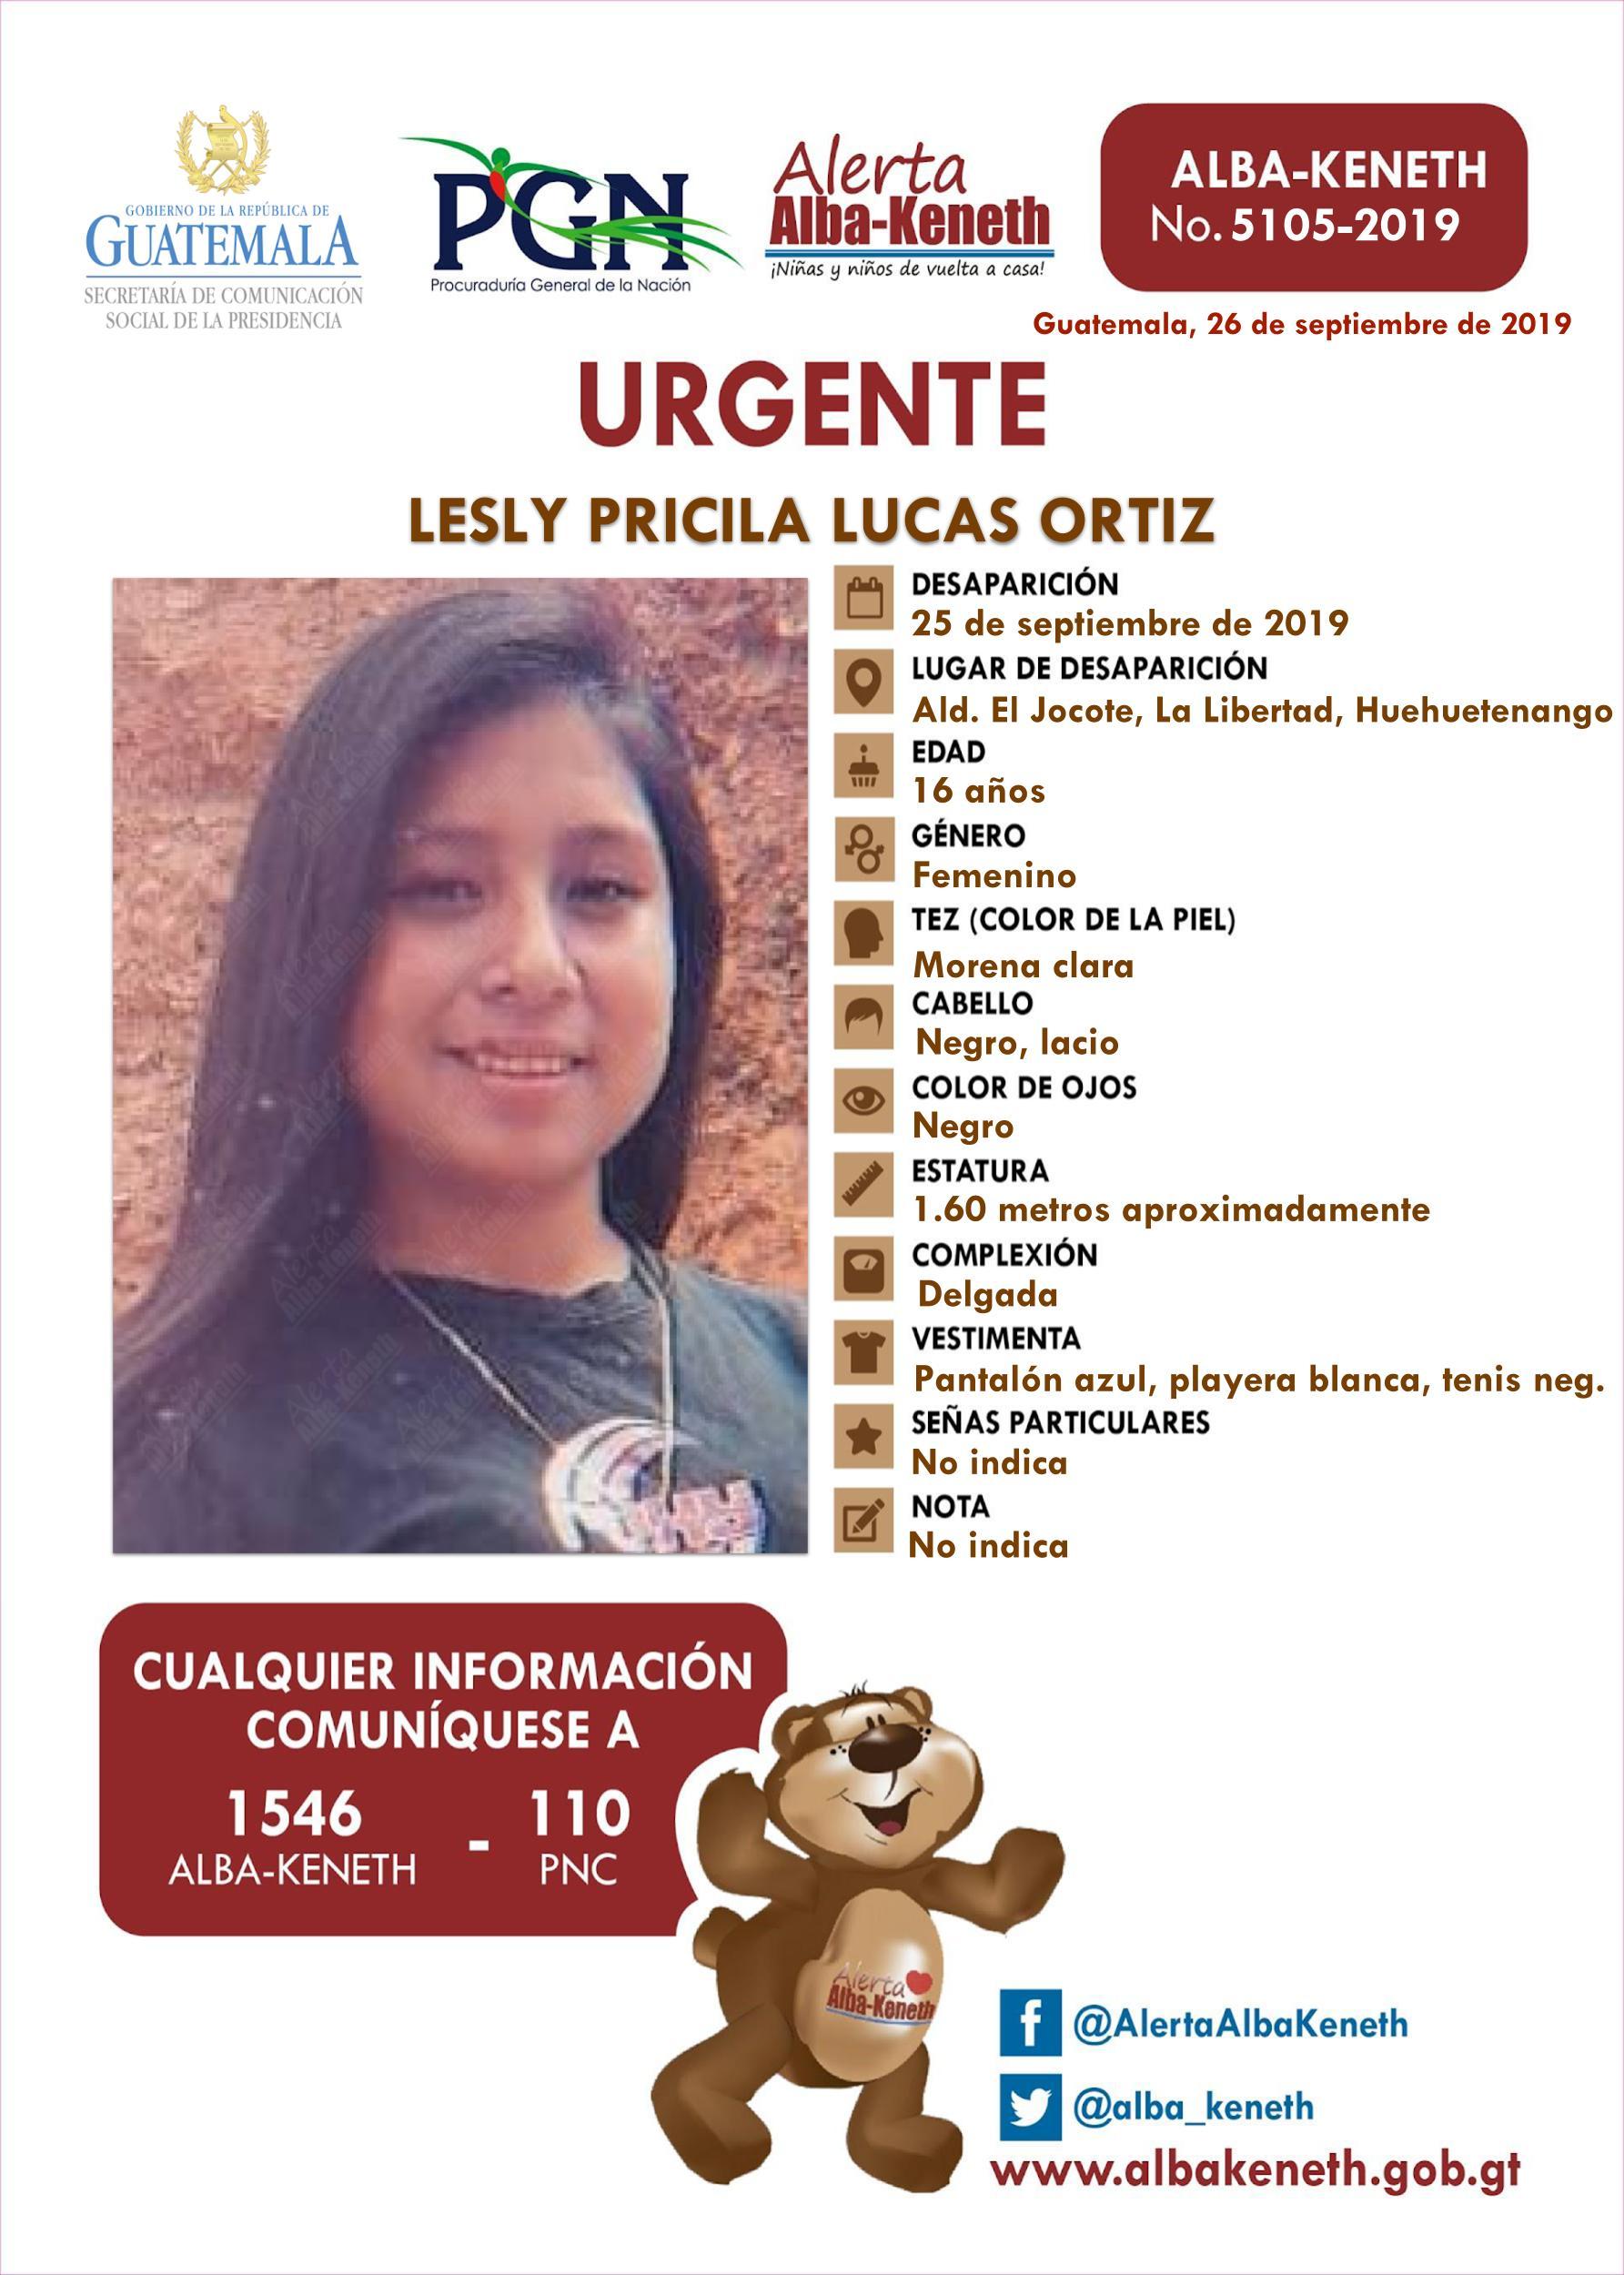 Lesly Pricila Lucas Ortiz